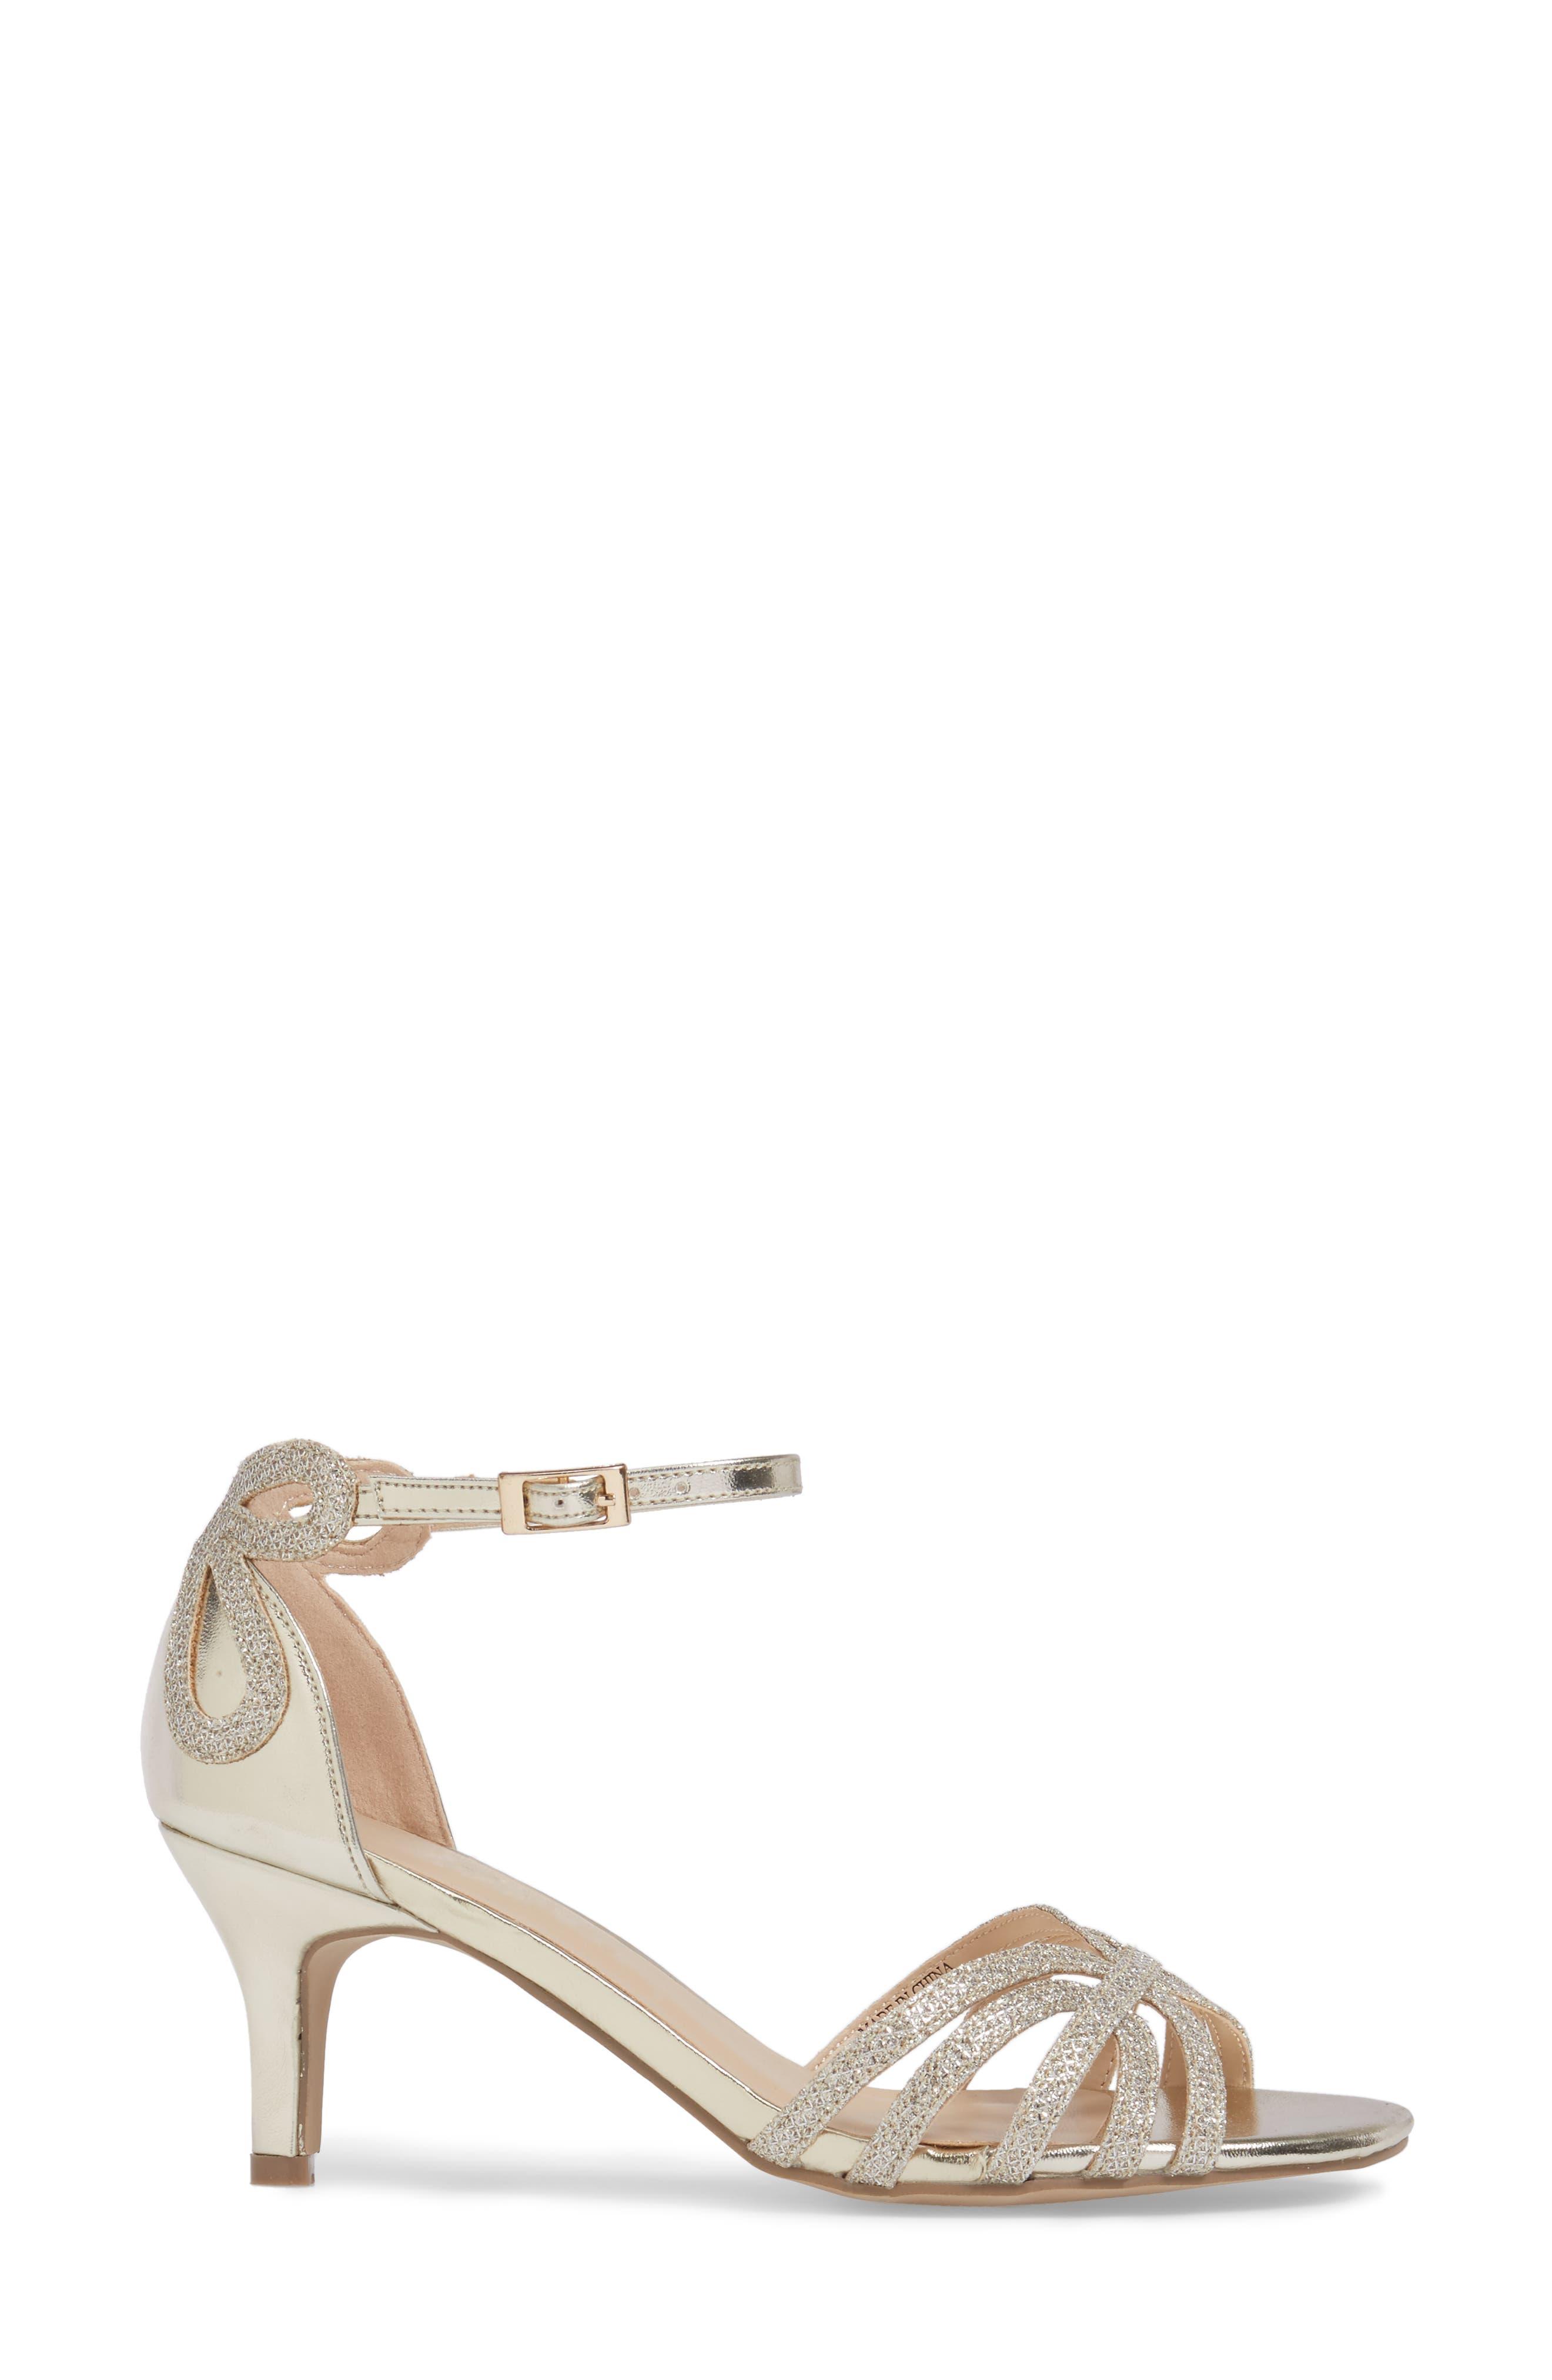 Melby Ankle Strap Sandal,                             Alternate thumbnail 3, color,                             Champagne